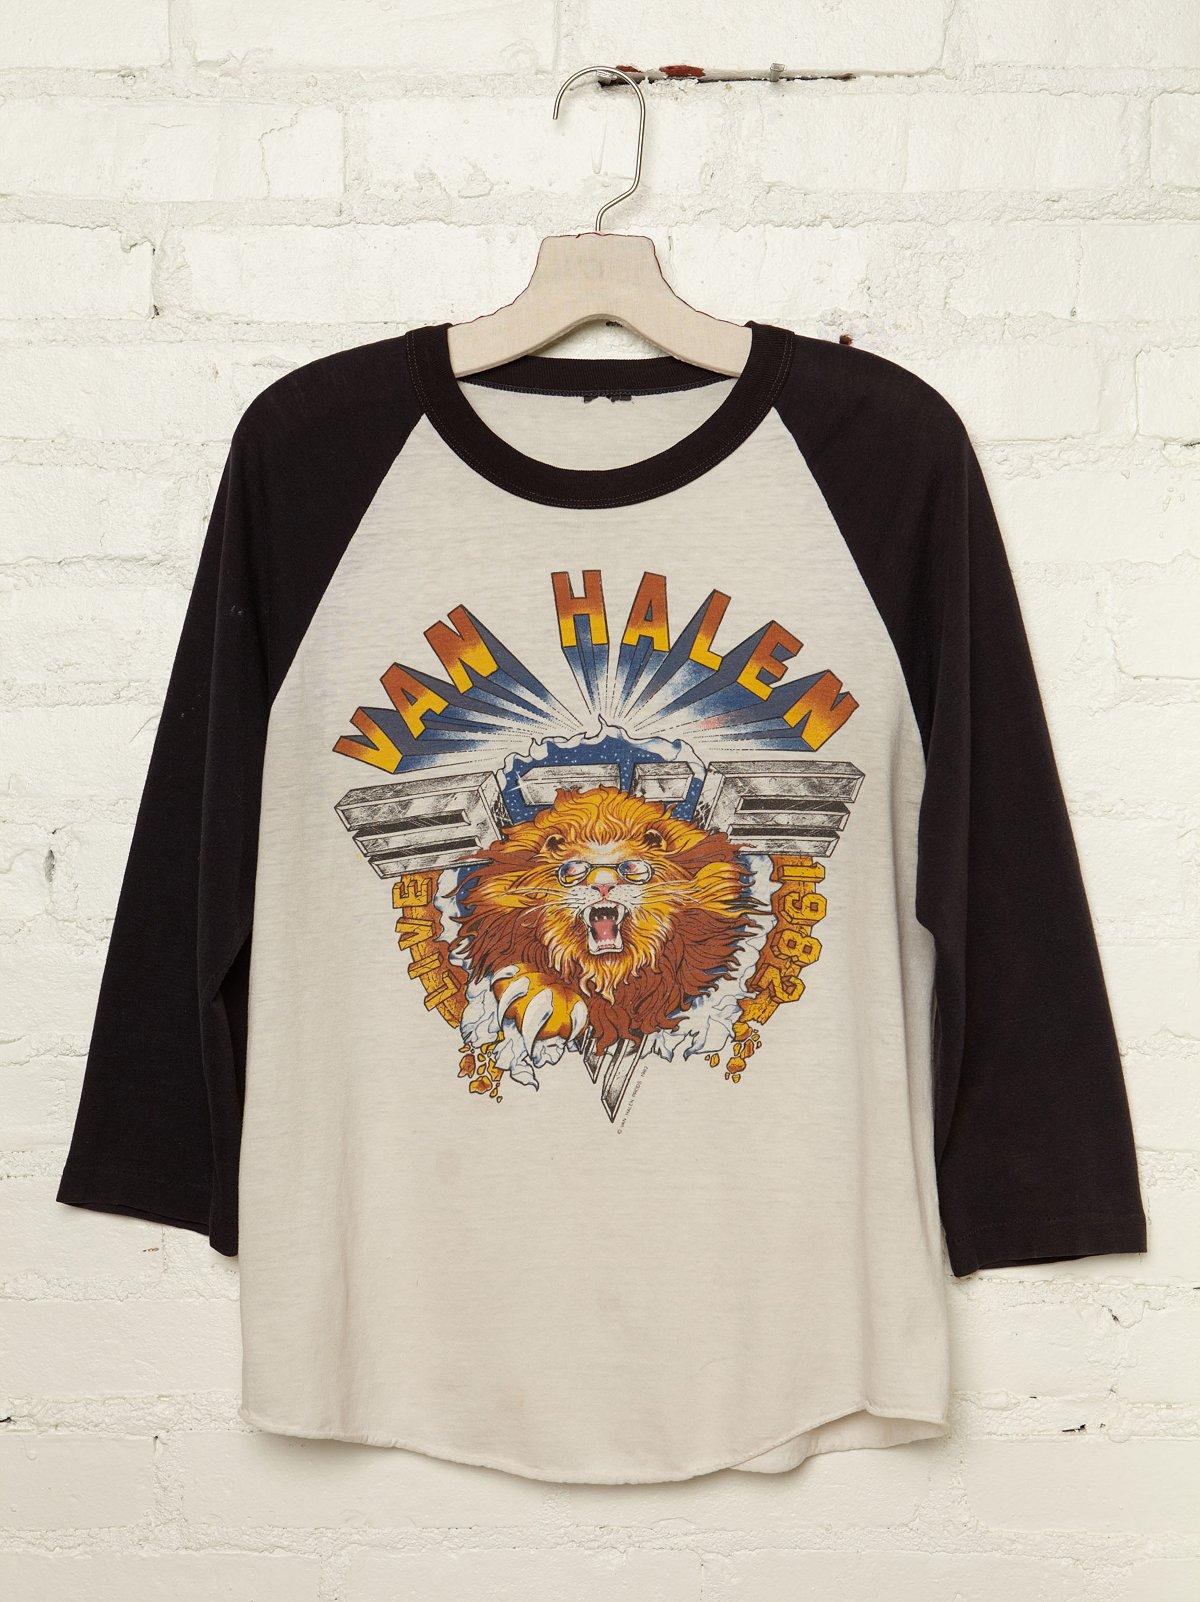 Vintage Van Halen 1982 Baseball Tee